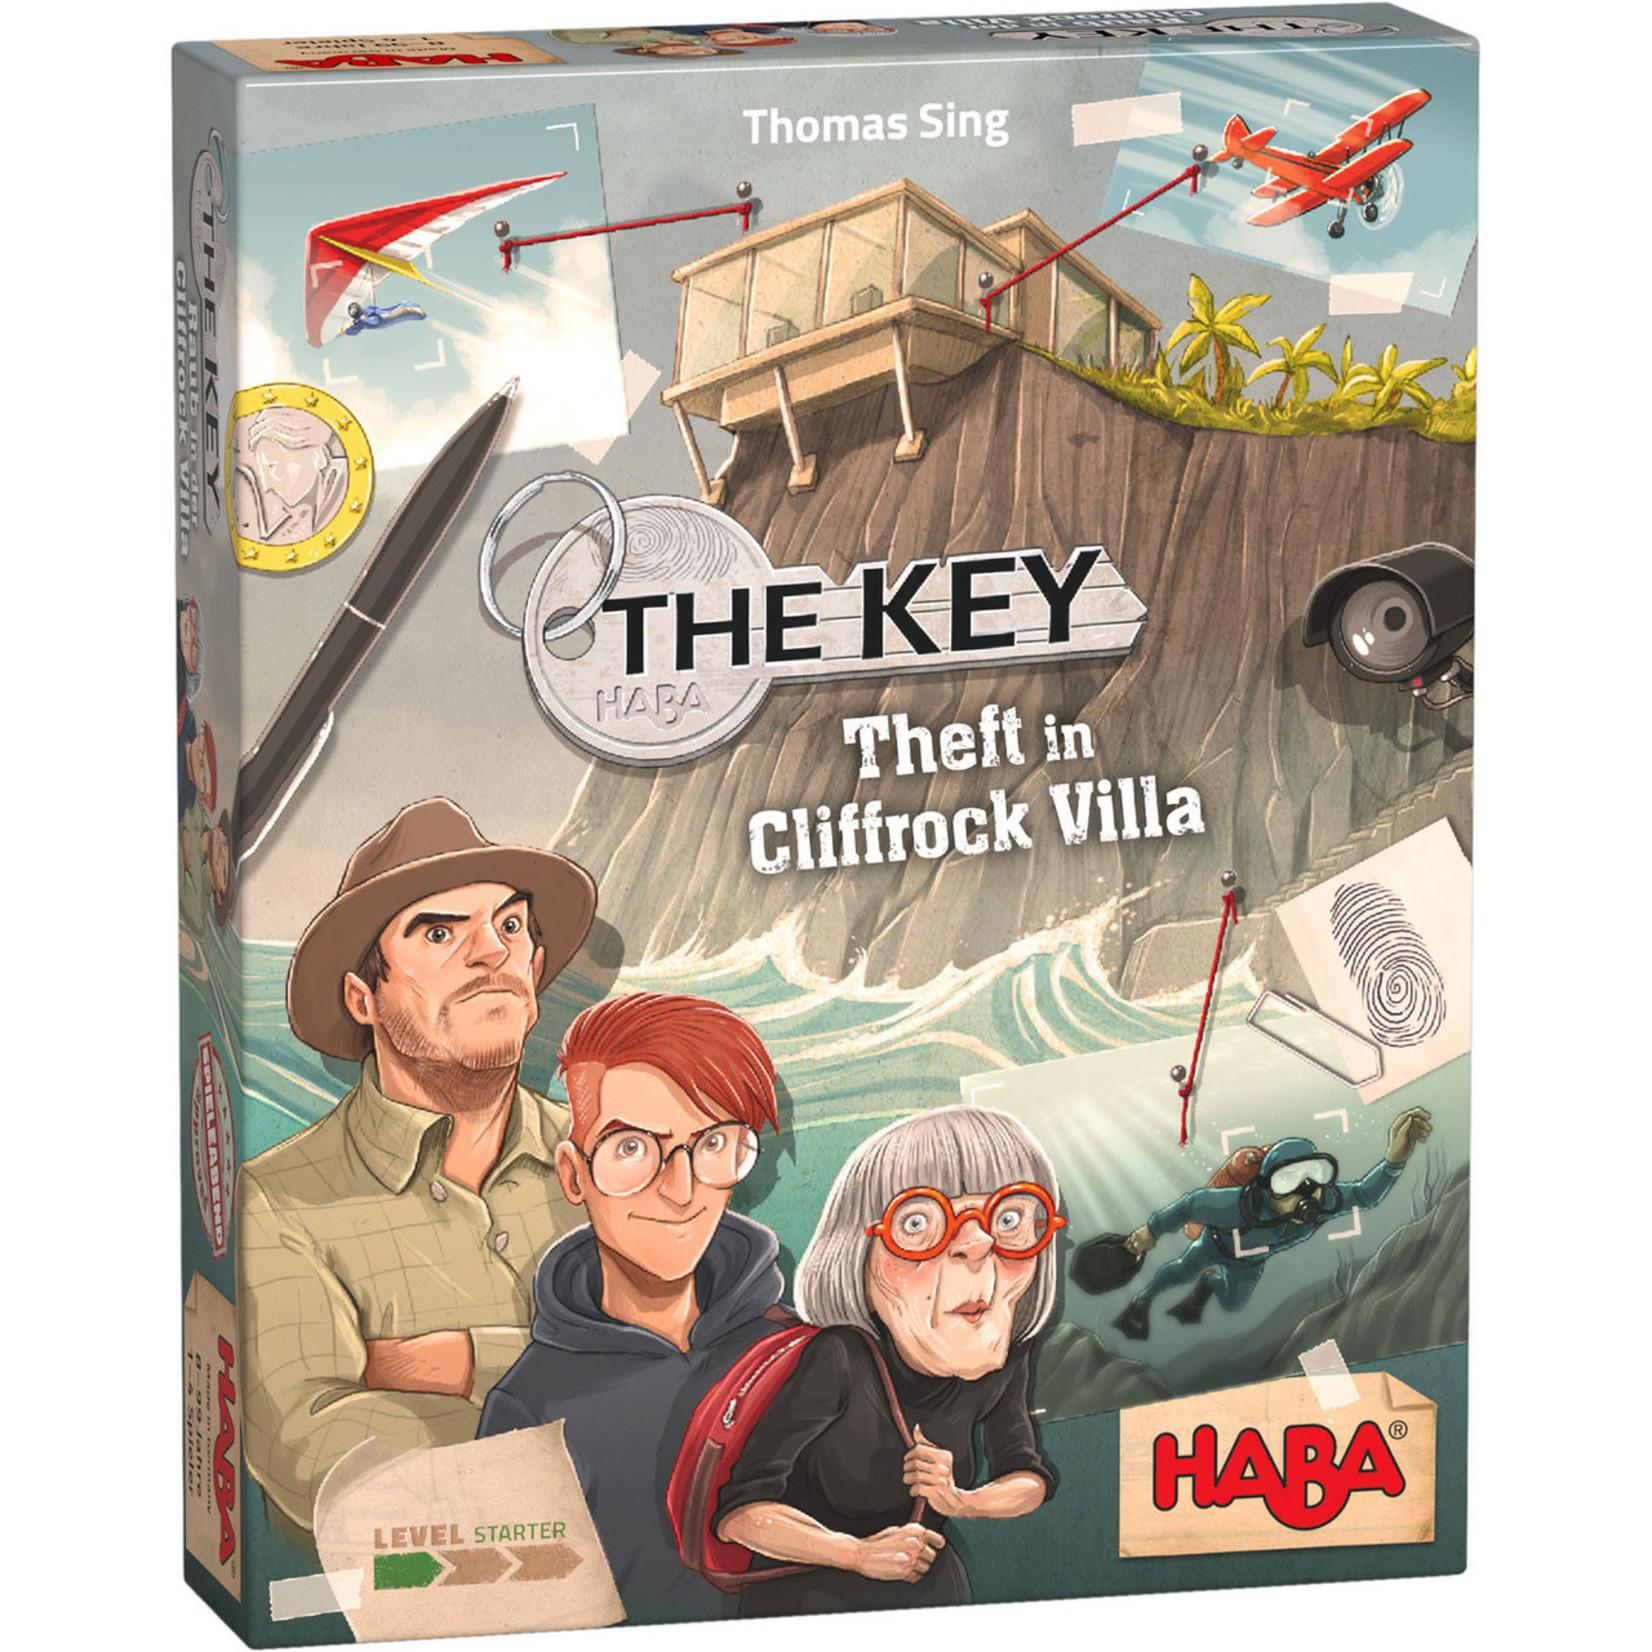 Haba The Key- Theft at Cliffrock Villa